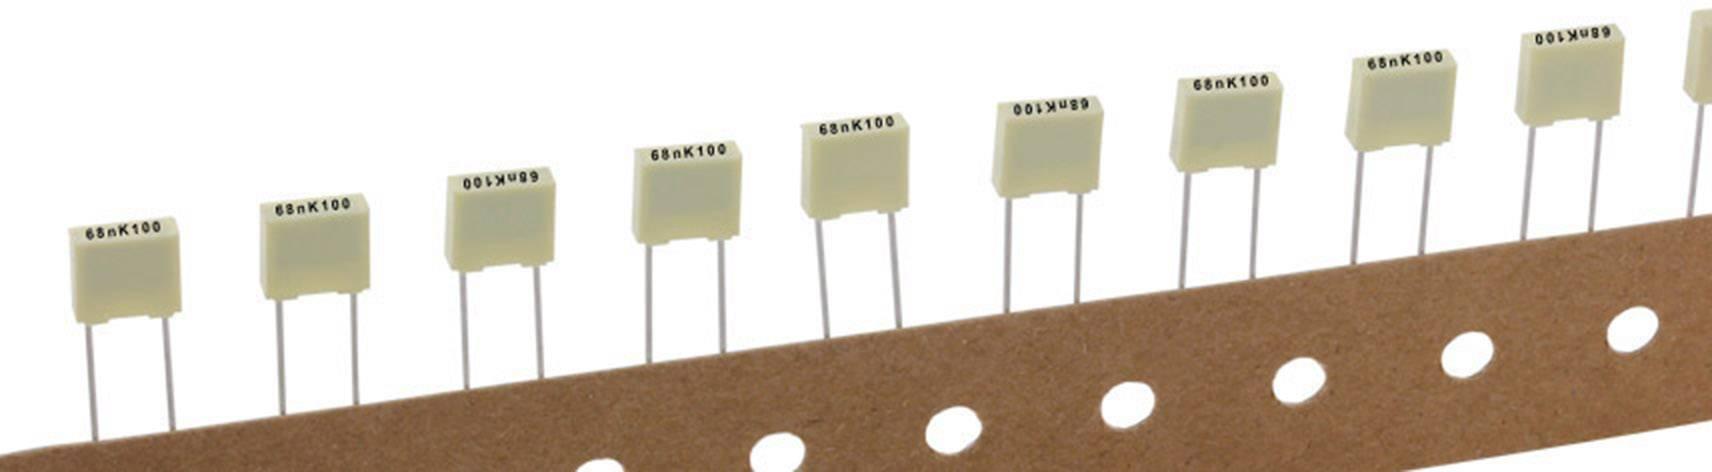 Polyesterový kondenzátor Kemet R82EC1220DQ50K+ radiálne vývody, 2.2 nF, 100 V,10 %, 5 mm, (d x š x v) 7.2 x 2.5 mm x 6.5 mm, 1 ks